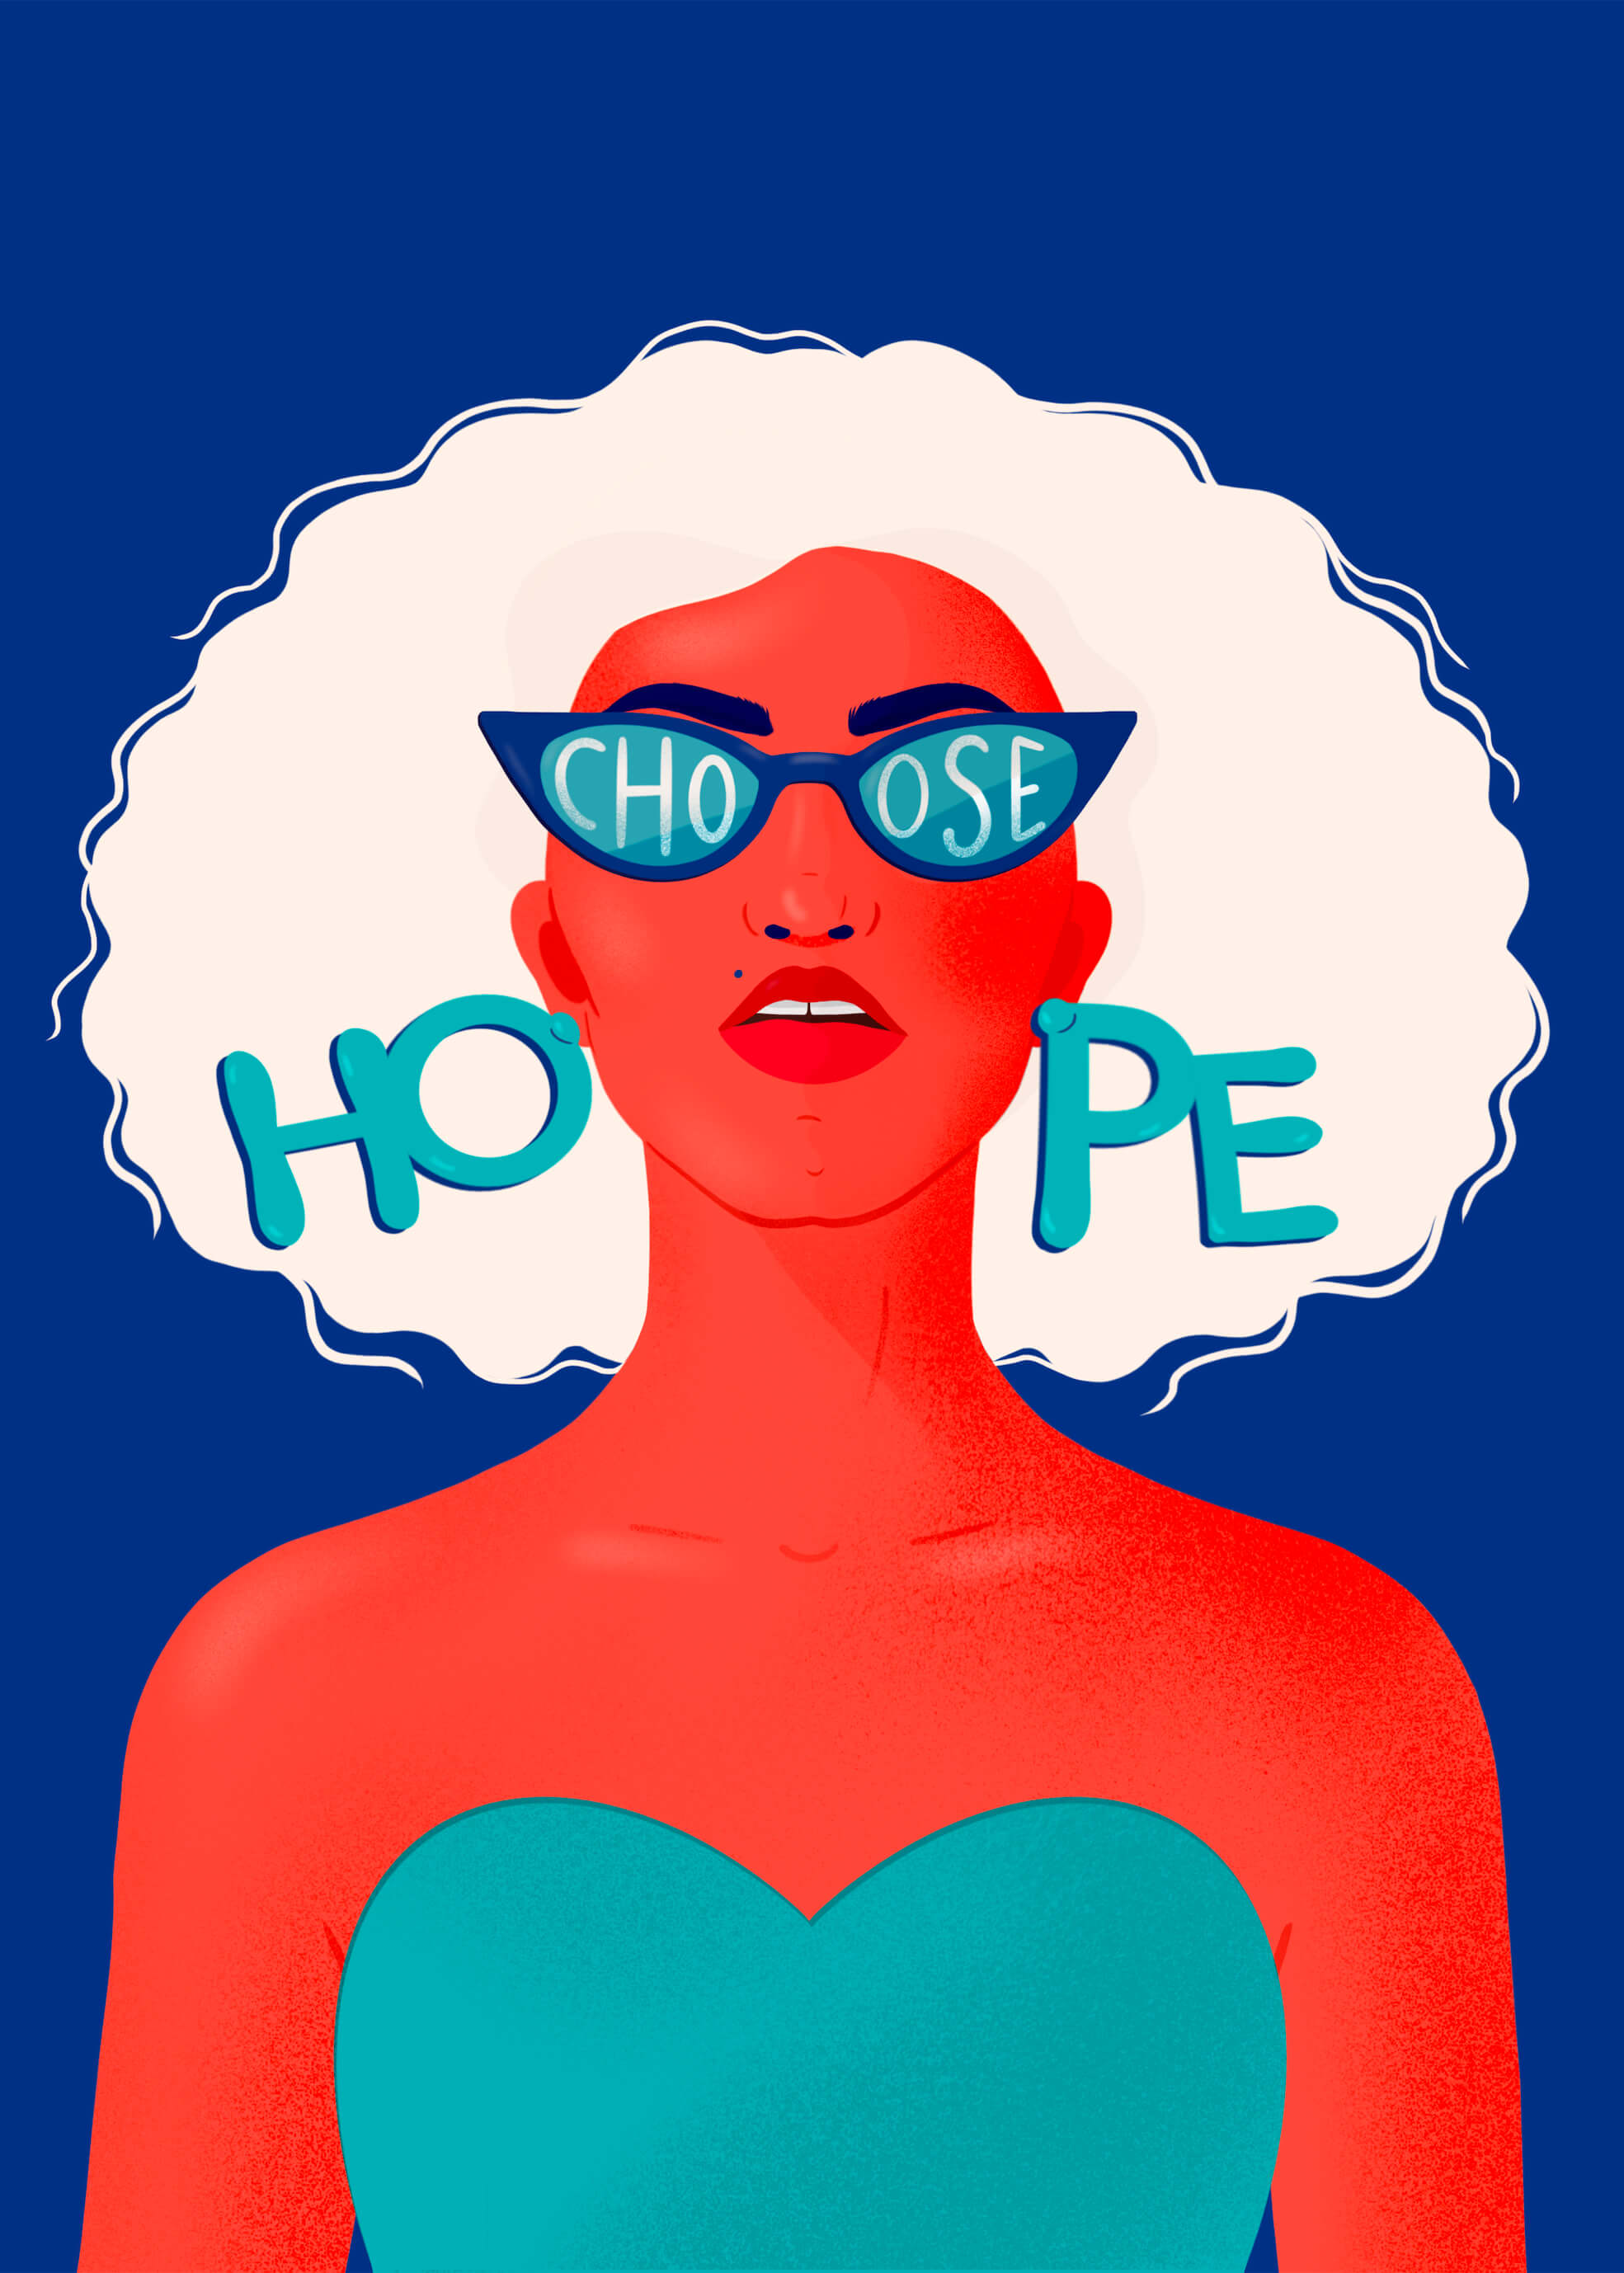 Choose Hope main image